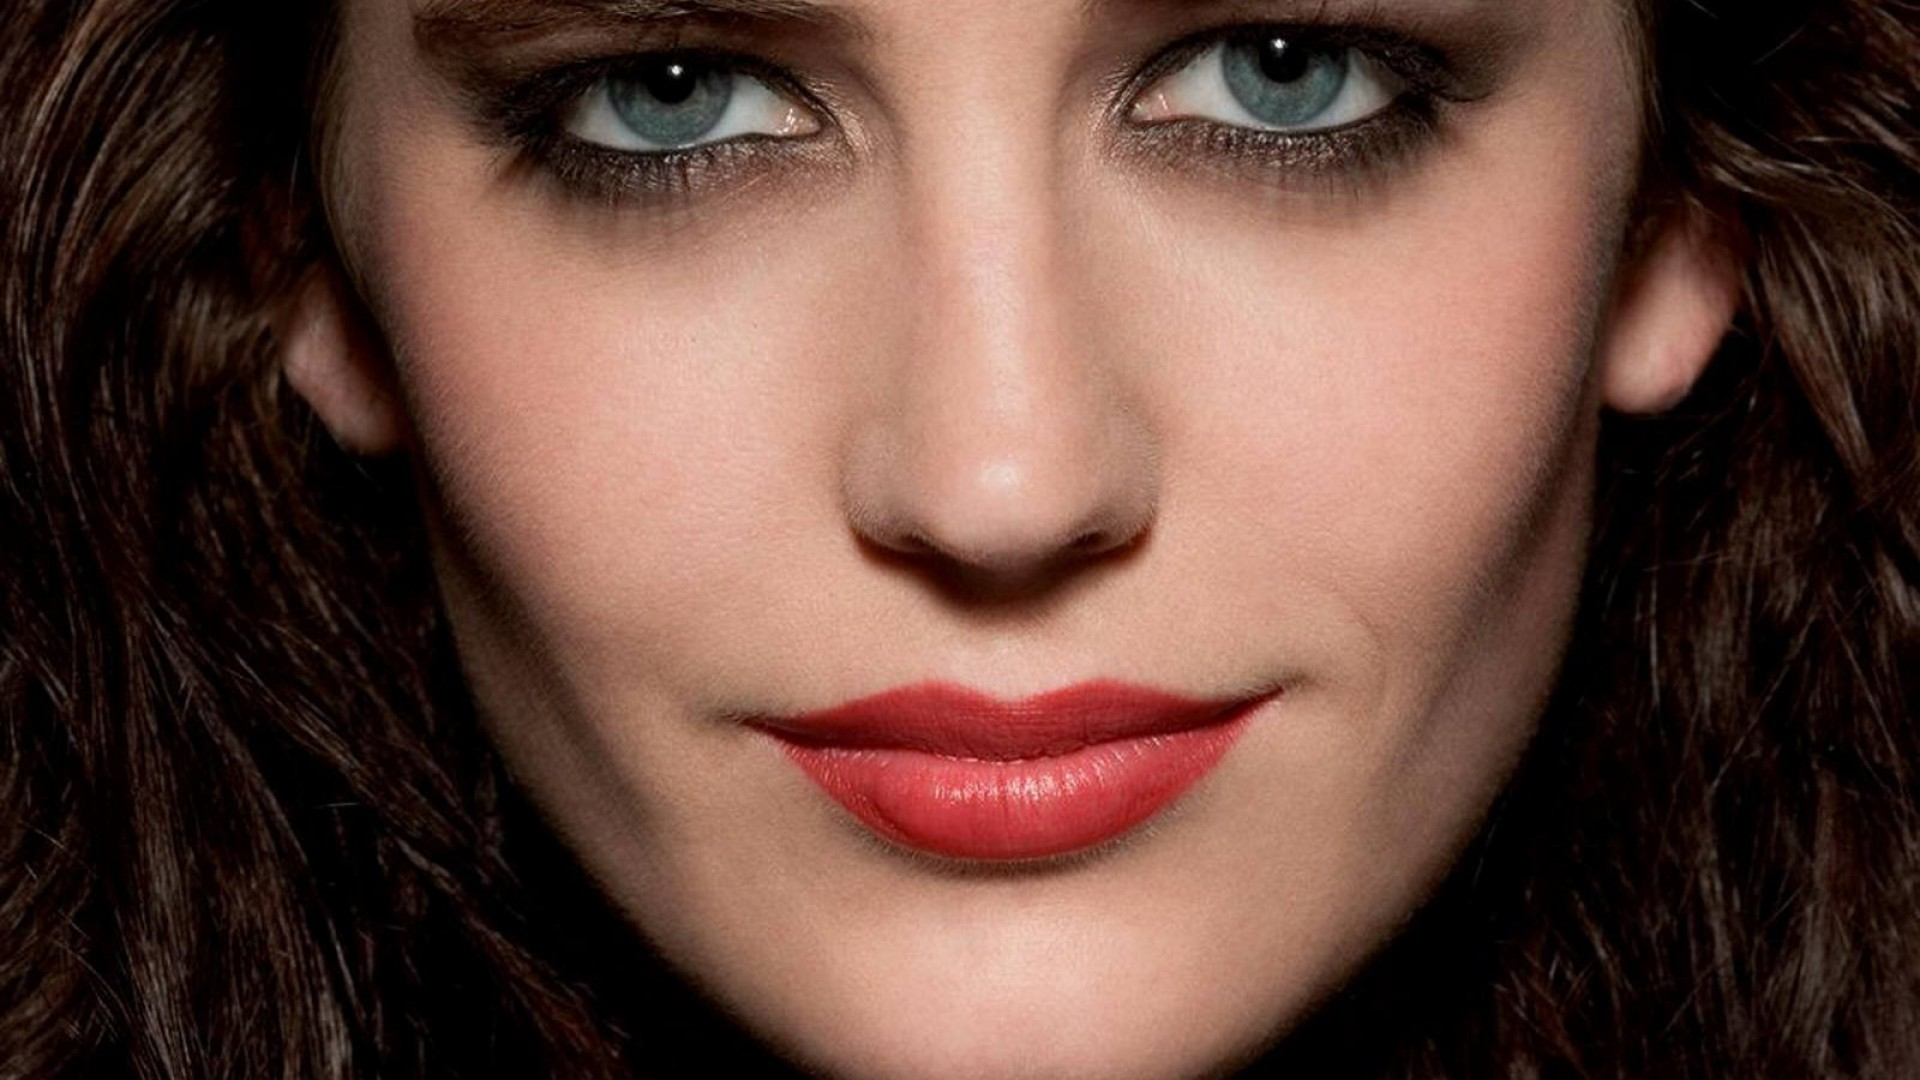 Eva Green HD wallpapers, Desktop wallpaper - most viewed